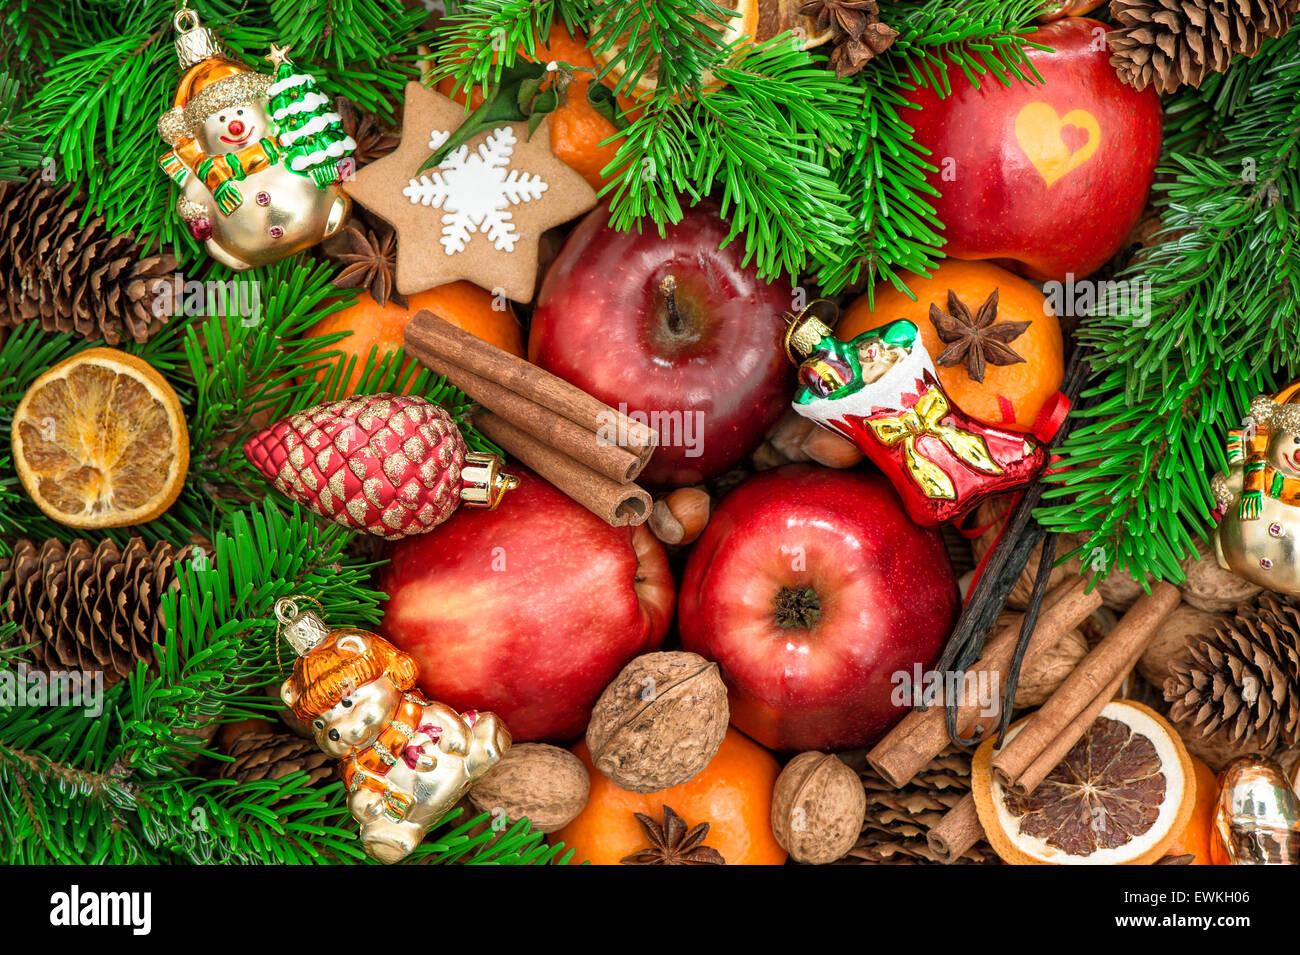 Christmas Tree Fruit Ornaments.Christmas Ornaments And Decorations Apples Mandarin Fruits